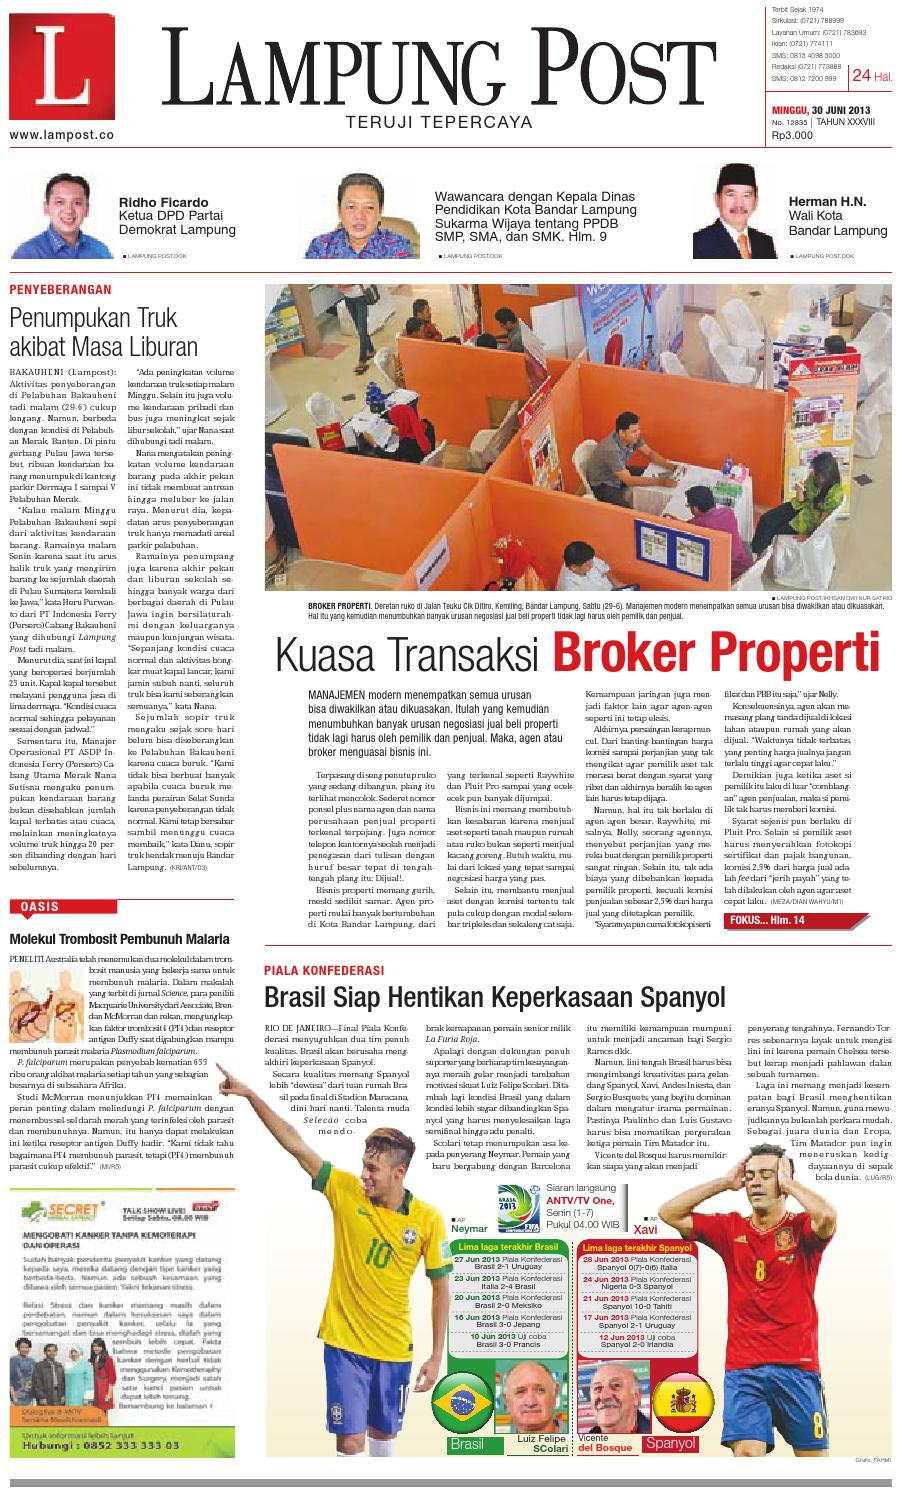 Lampungpost edisi 30 juni 2013 by Lampung Post - issuu 4e63112f2a